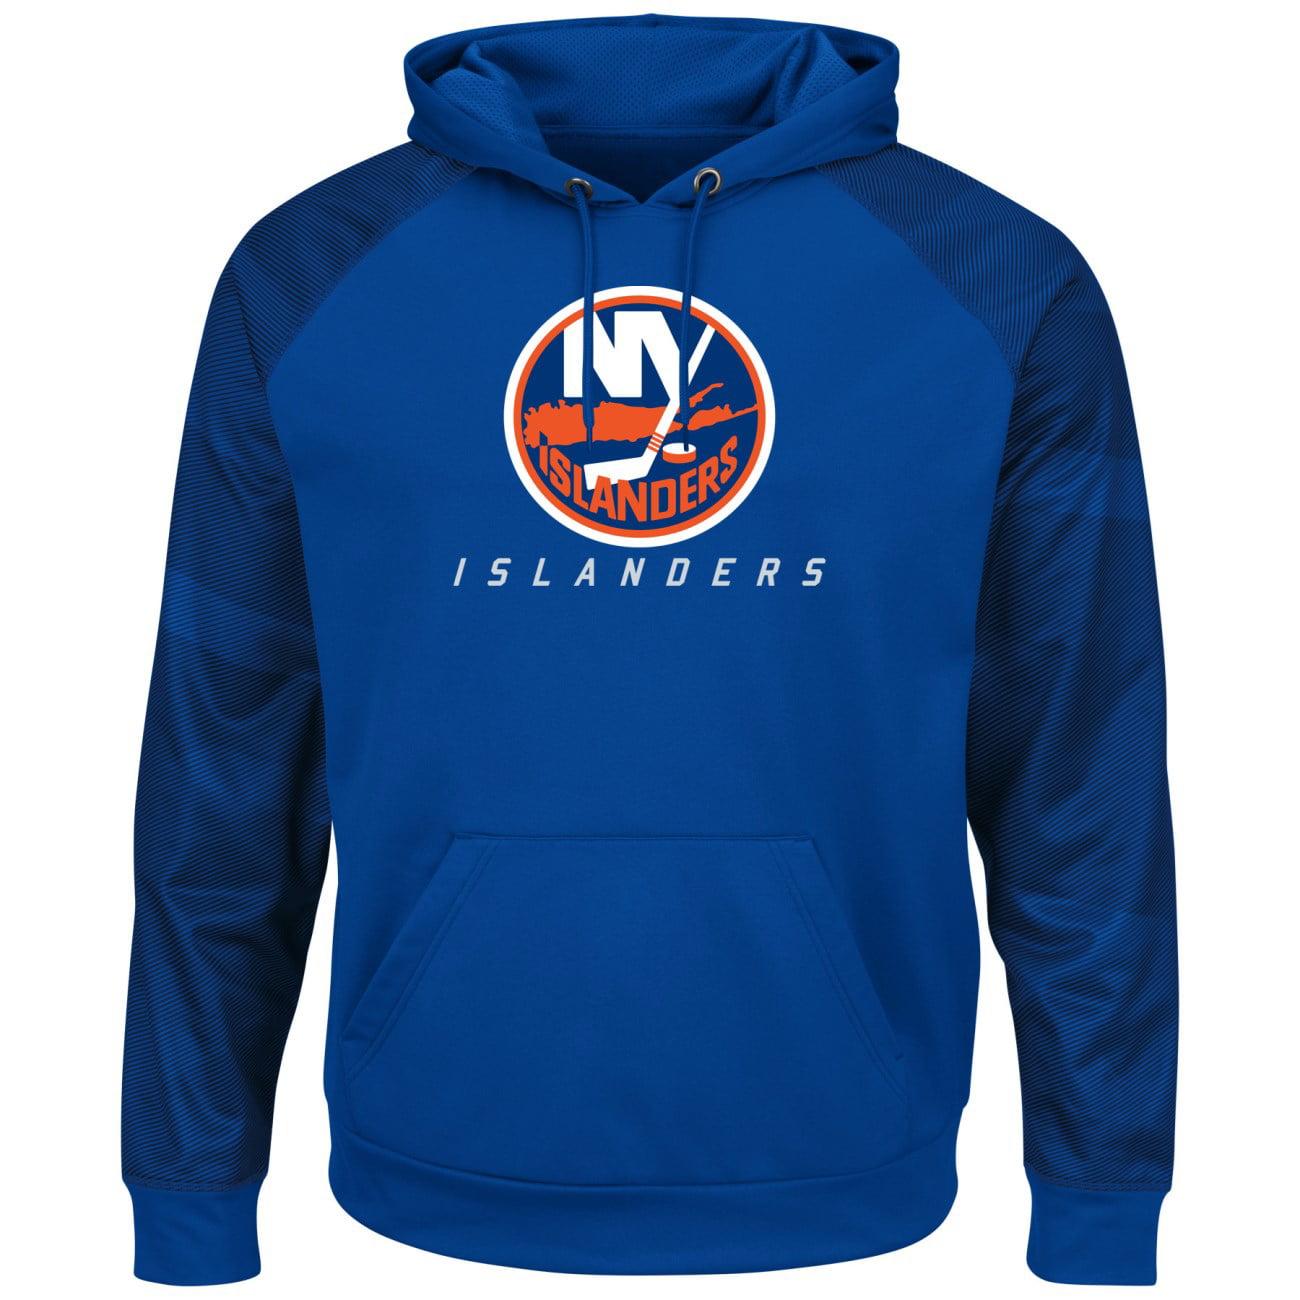 New York Islanders Majestic NHL Penalty Shot Men's Hooded Therma Base Sweatshirt by MAJESTIC LSG